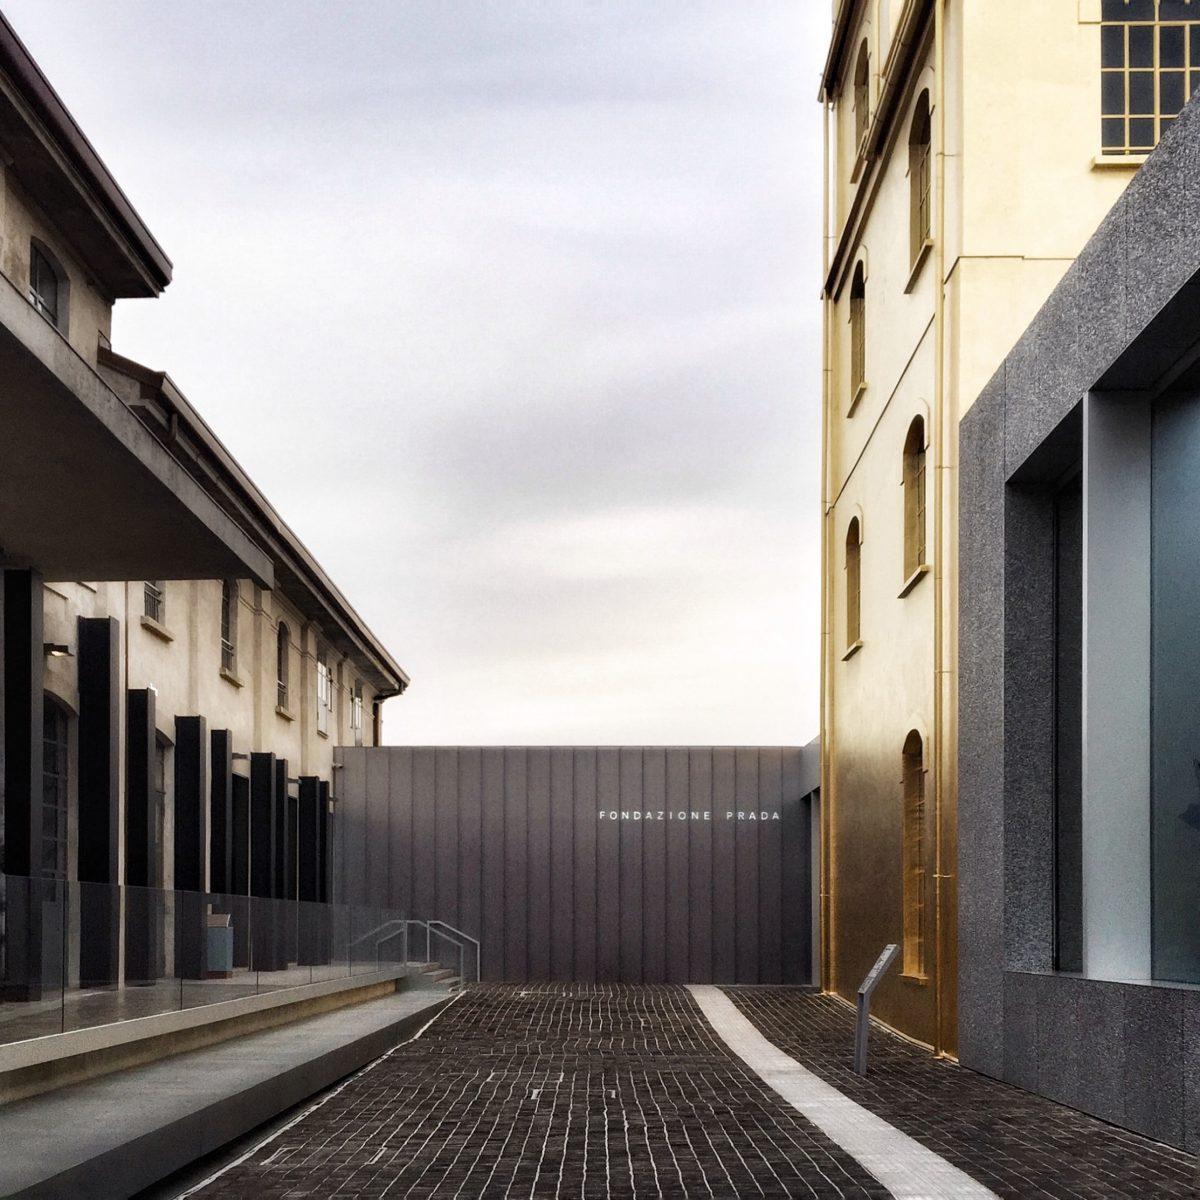 KVADRAT_Fondazione_Prada_00-1200x1200.jpg